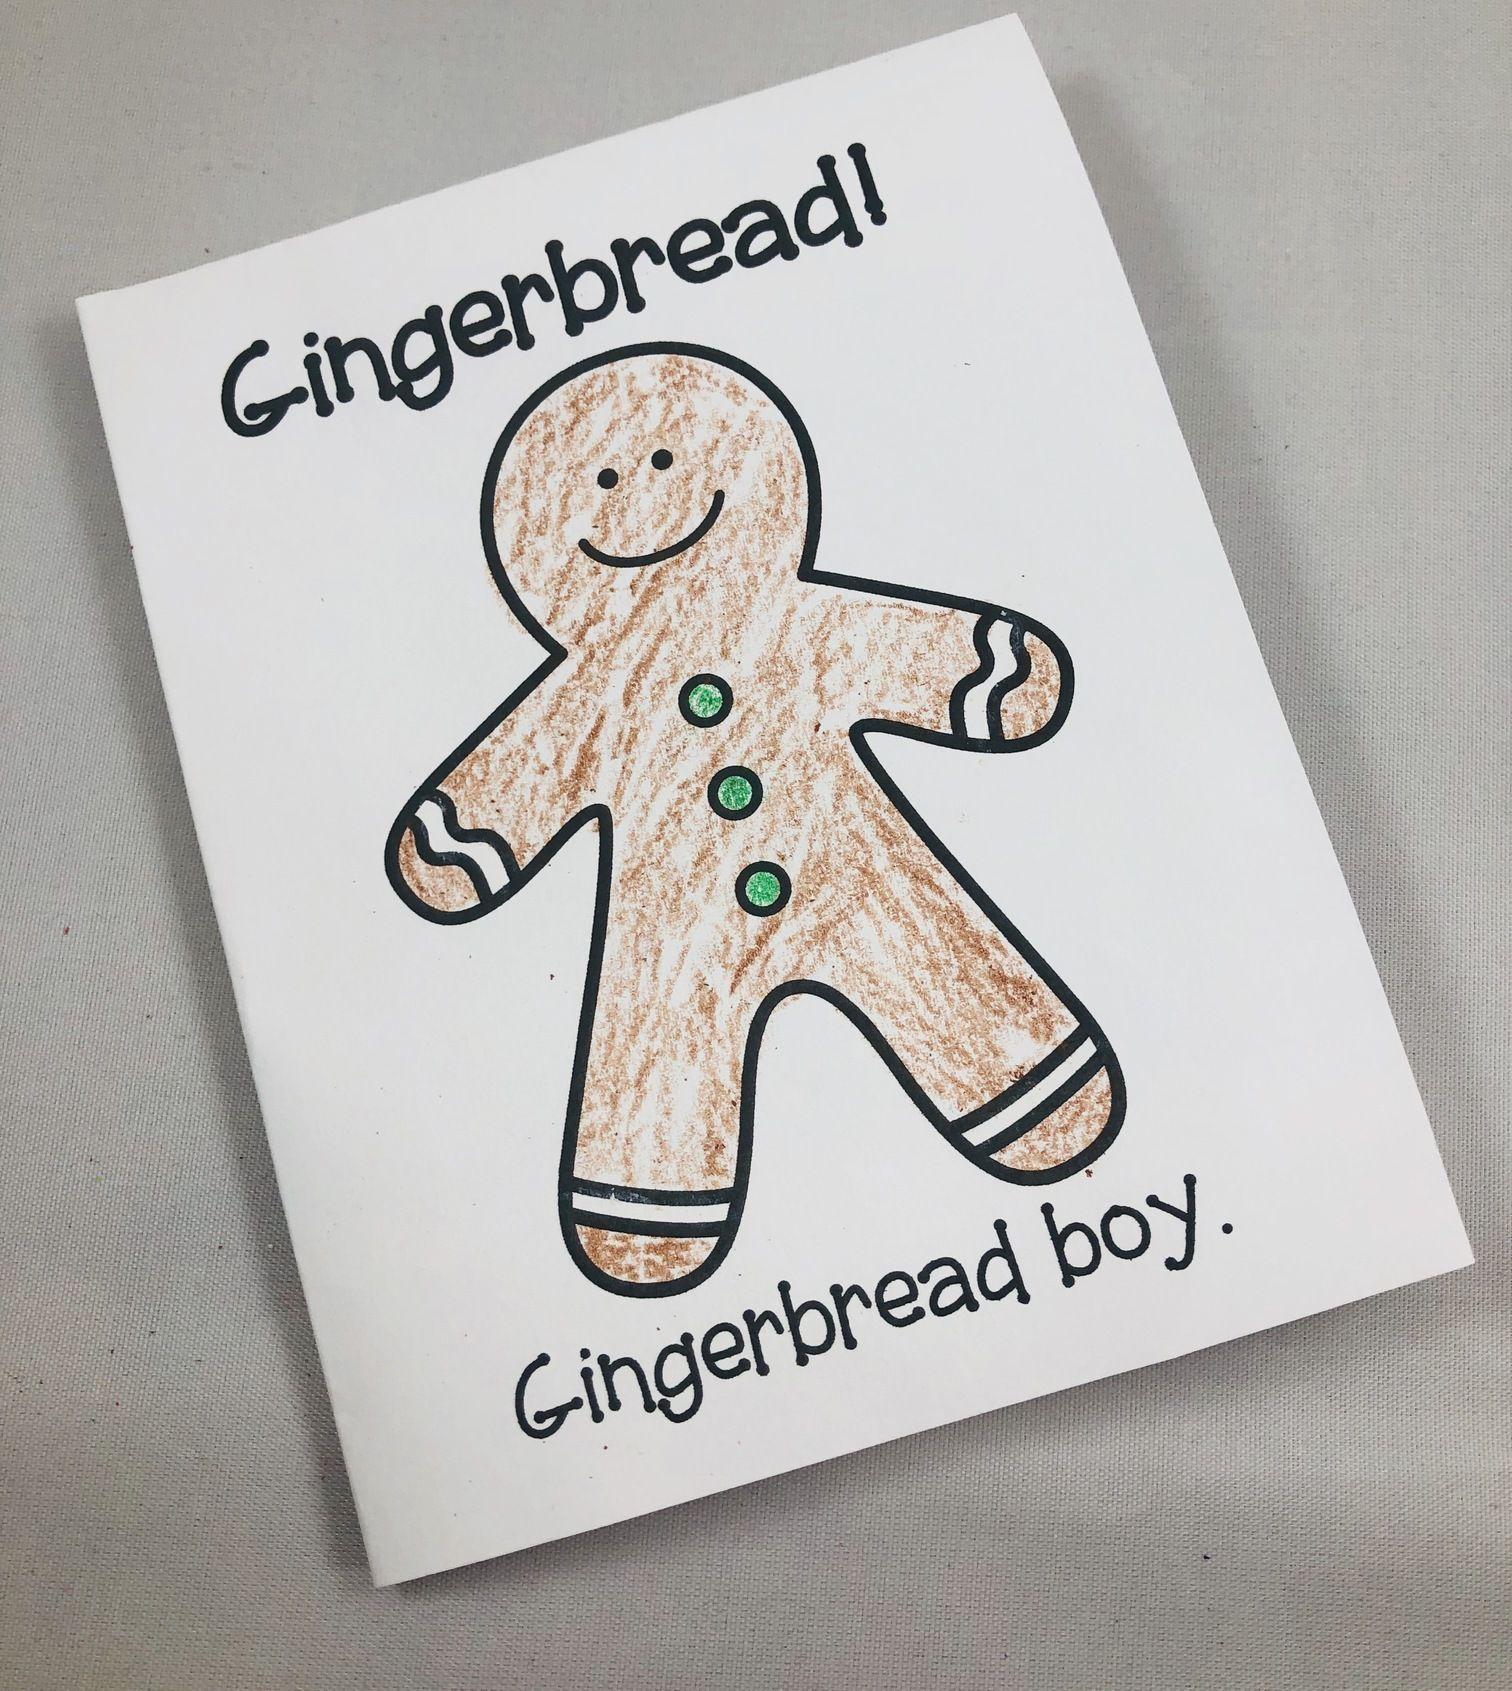 Gingerbread Man Lesson Plans For Preschool And Prek